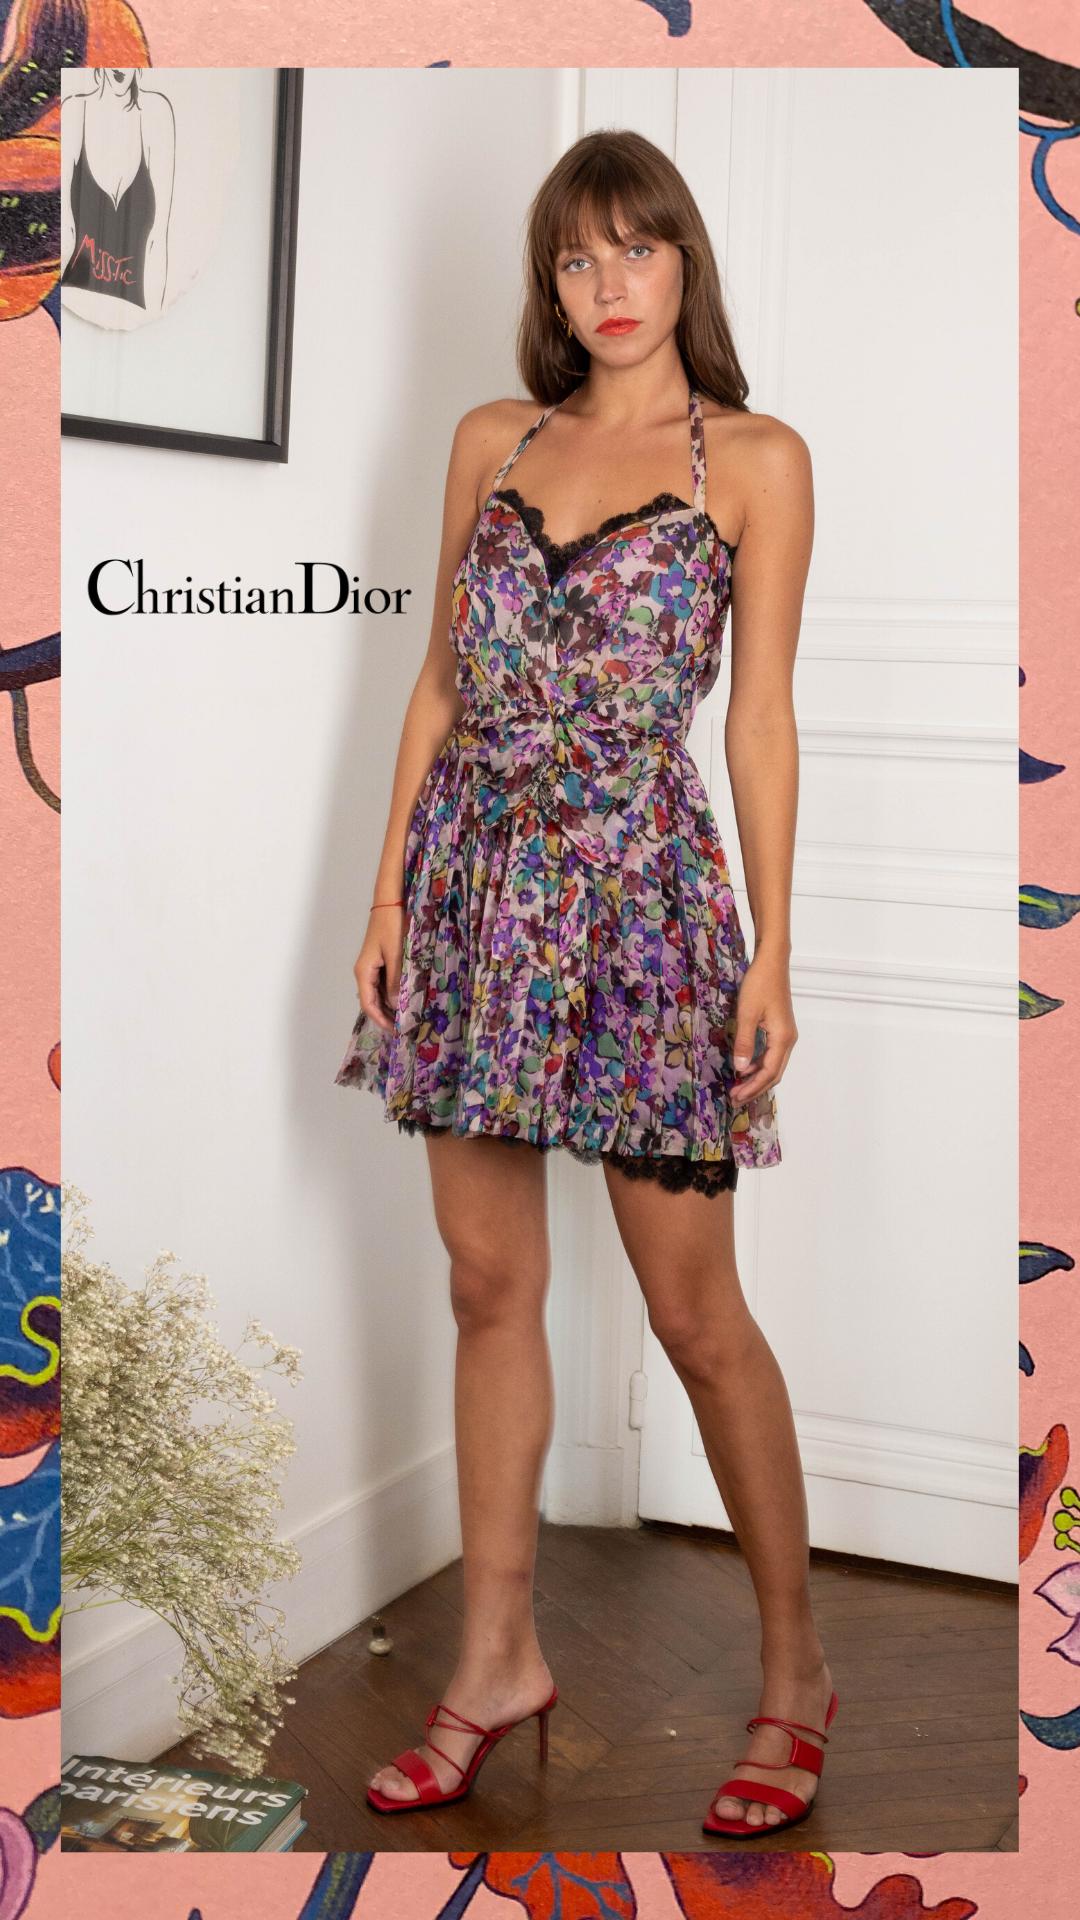 Christian Dior Dress - 450€